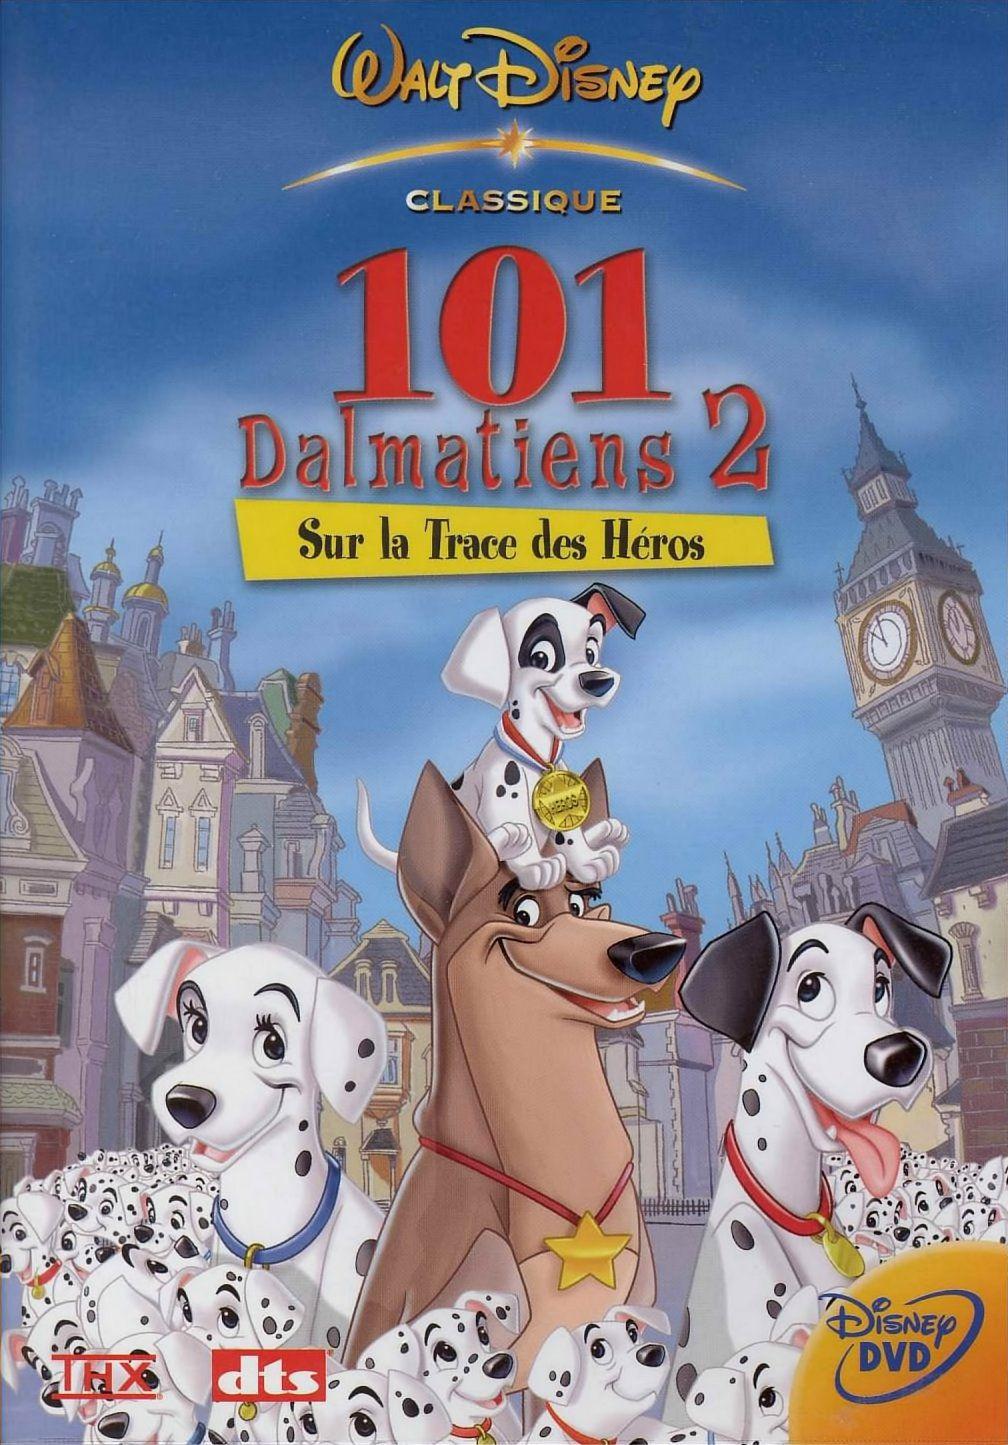 Les 101 Dalmatiens 2